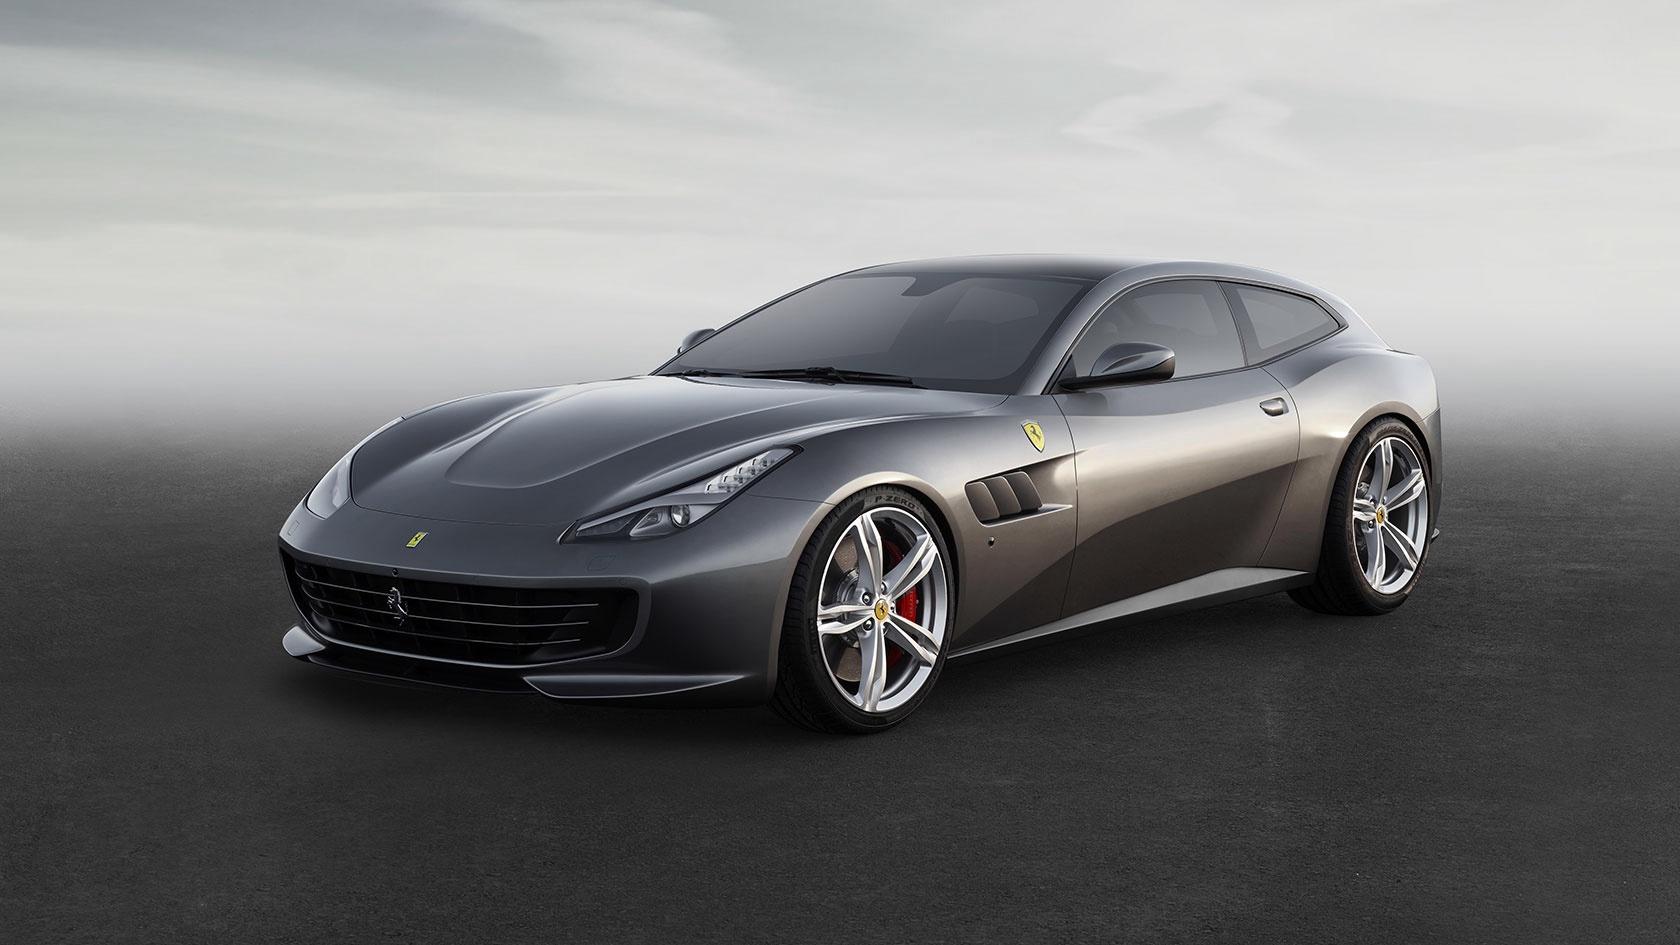 New 2020 Ferrari GTC4LUSSO for sale Sold at Rolls-Royce Motor Cars Greenwich in Greenwich CT 06830 1